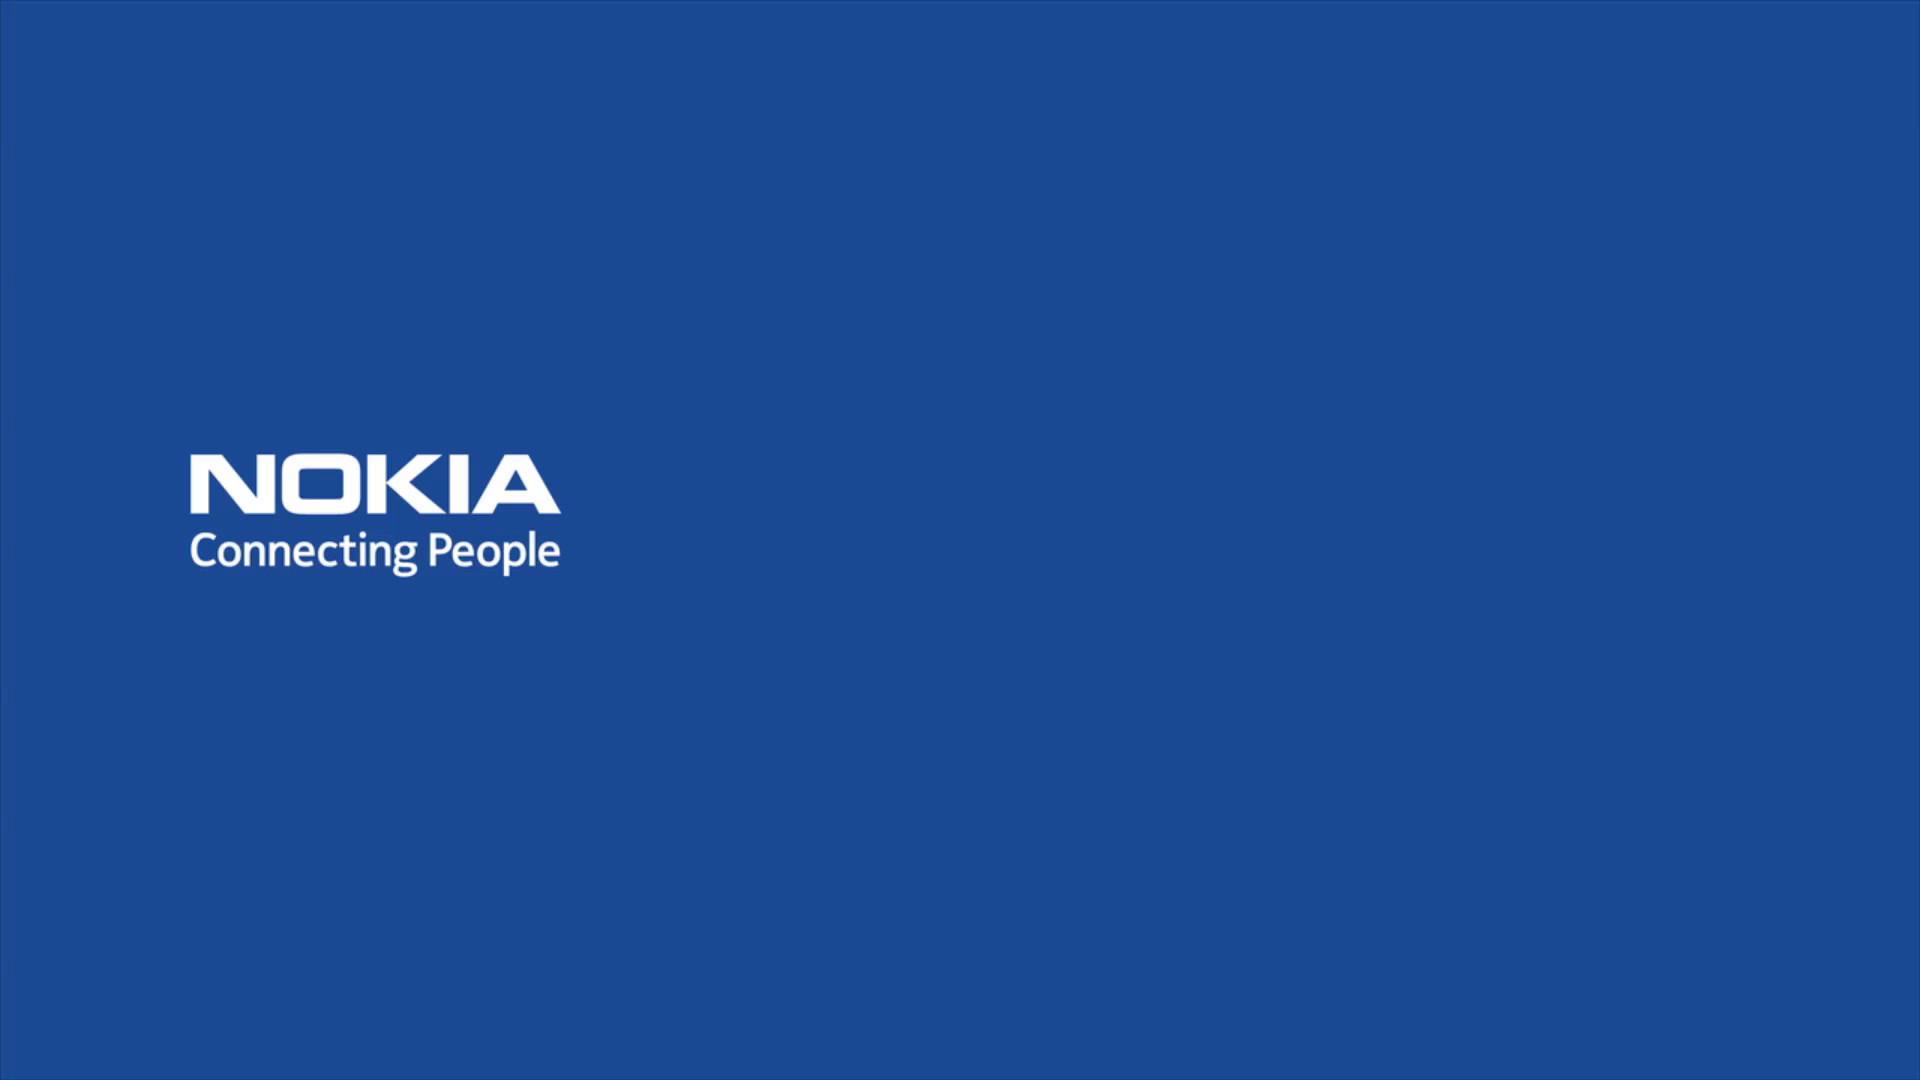 10 Nokia Logo Wallpapers On Wallpapersafari